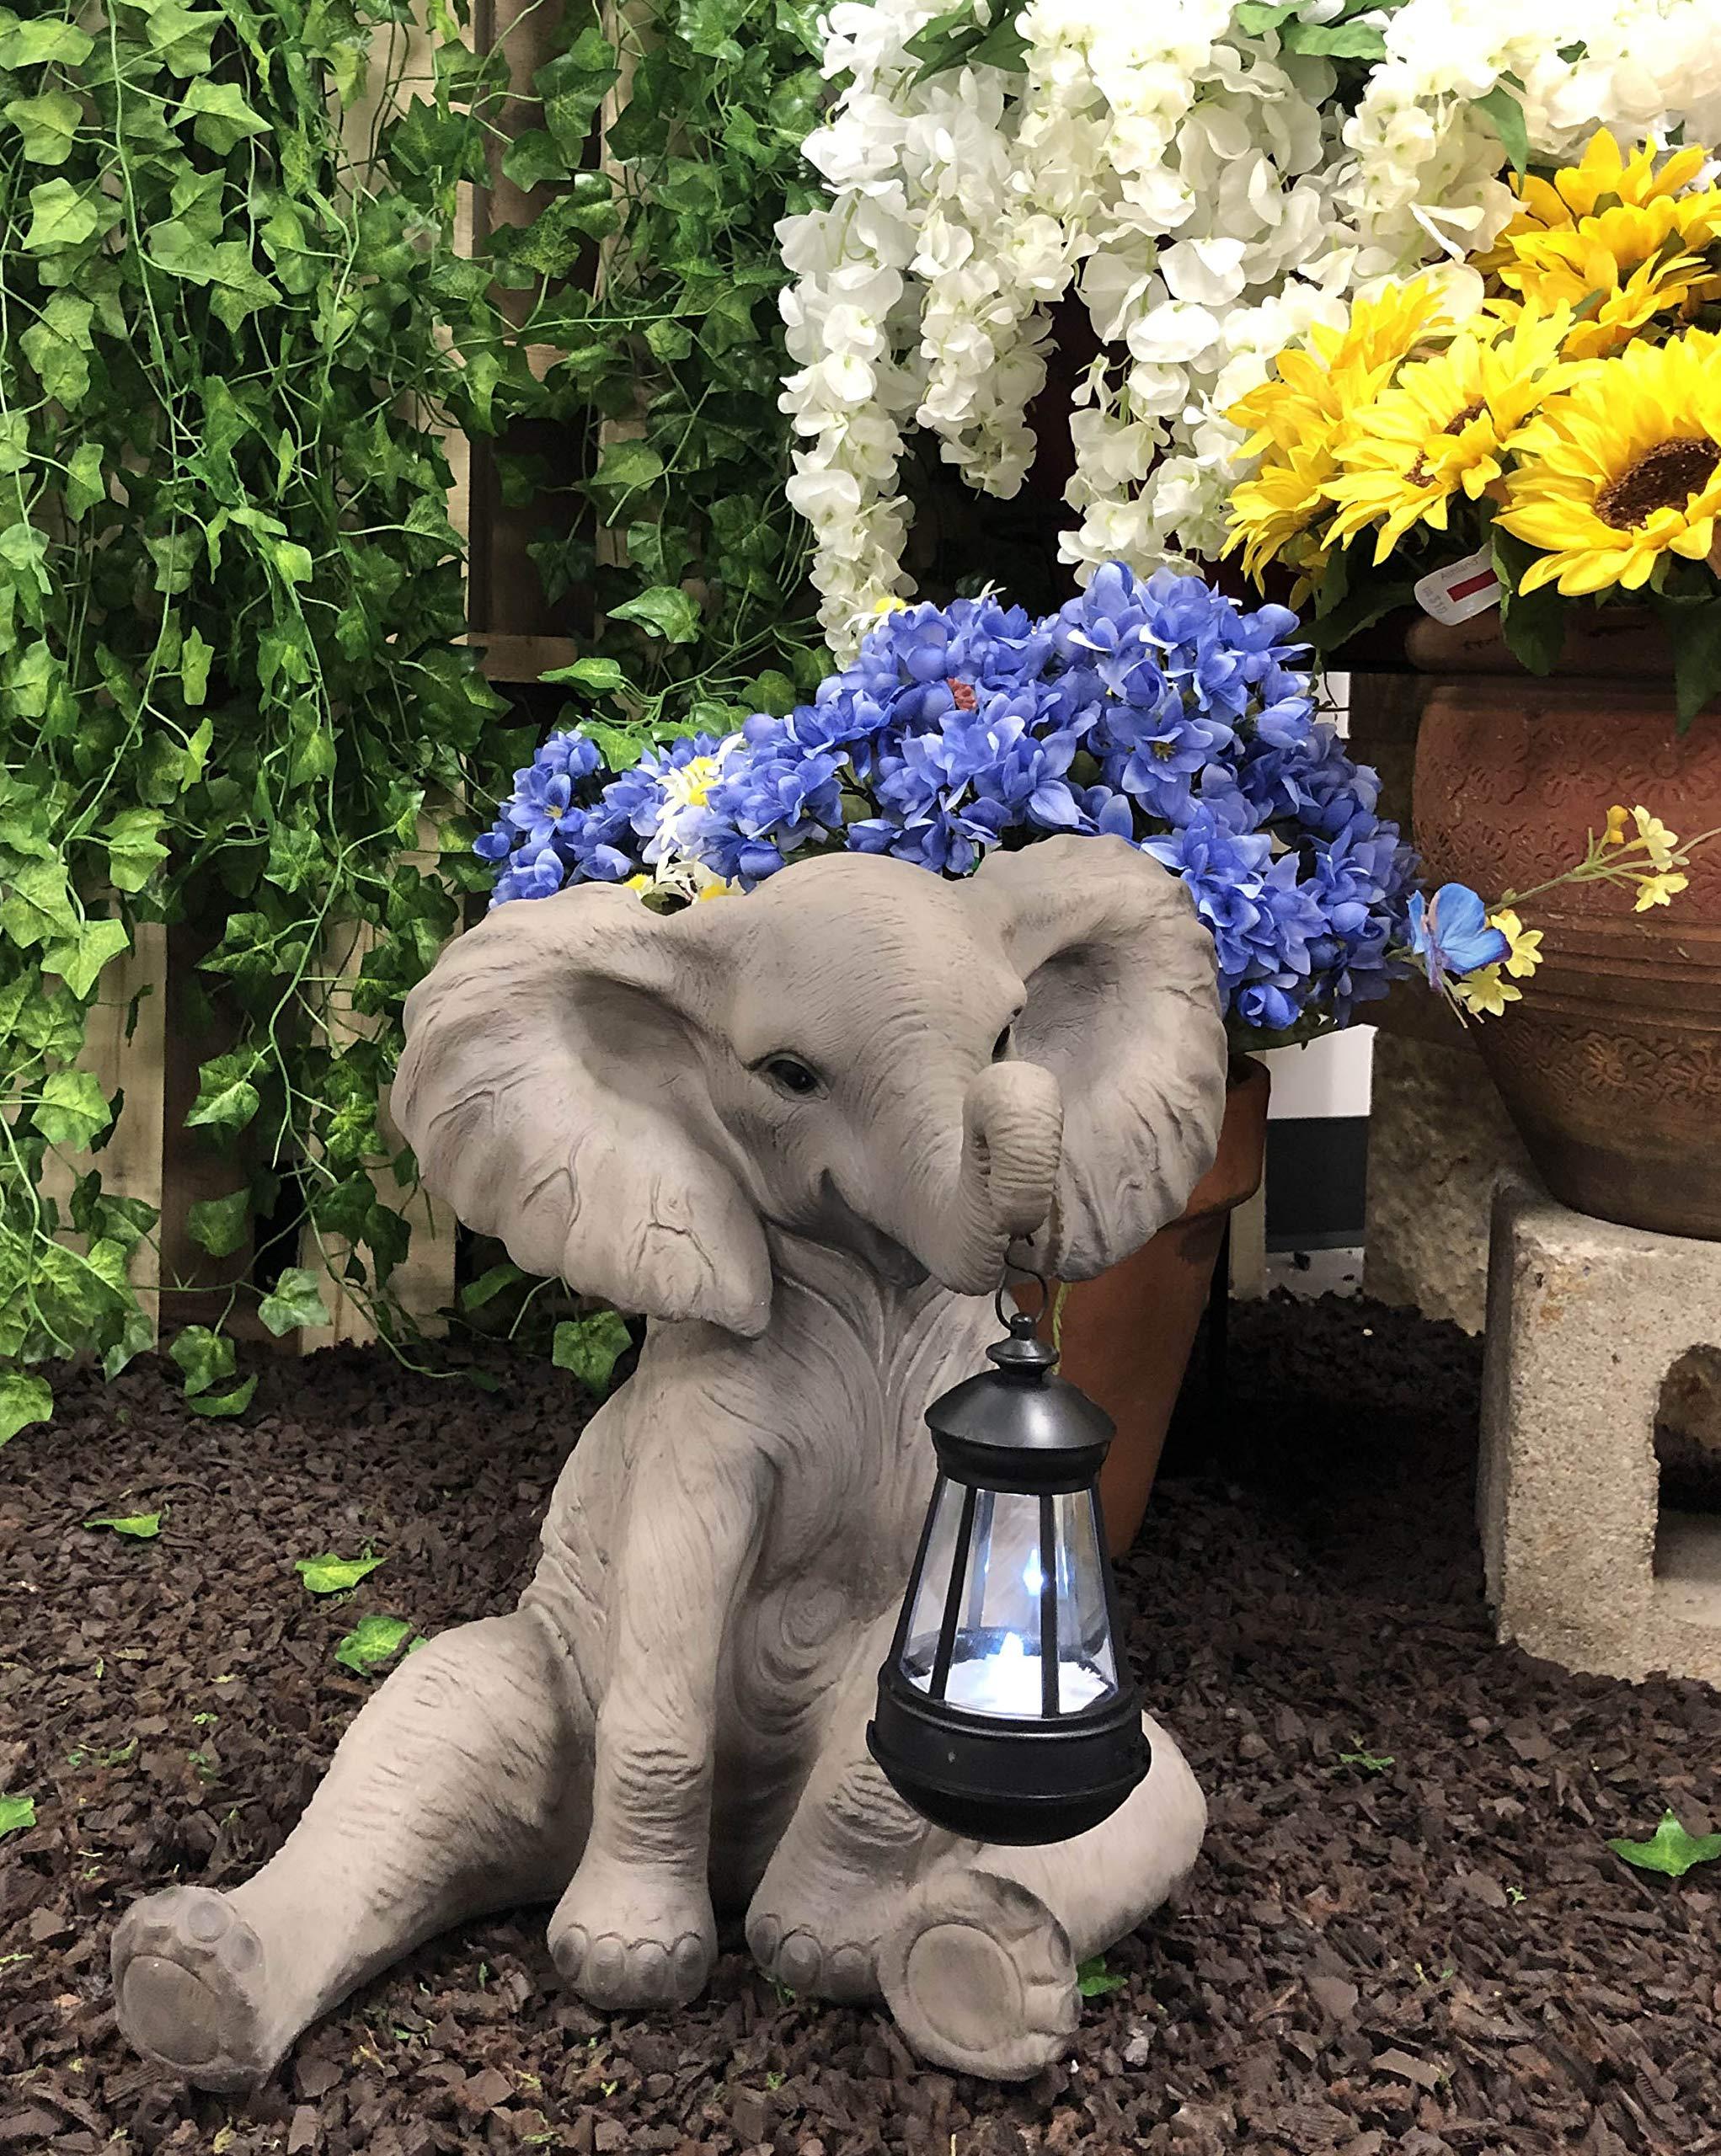 Ebros Safari Savanna Wildlife Animal Melee Adorable Pachy Elephant Statue Home Patio Decor Figurine with Solar LED Light Lantern Lamp 13.75'' H Guest Greeter Elephants Path Lighter Sculpture by Ebros Gift